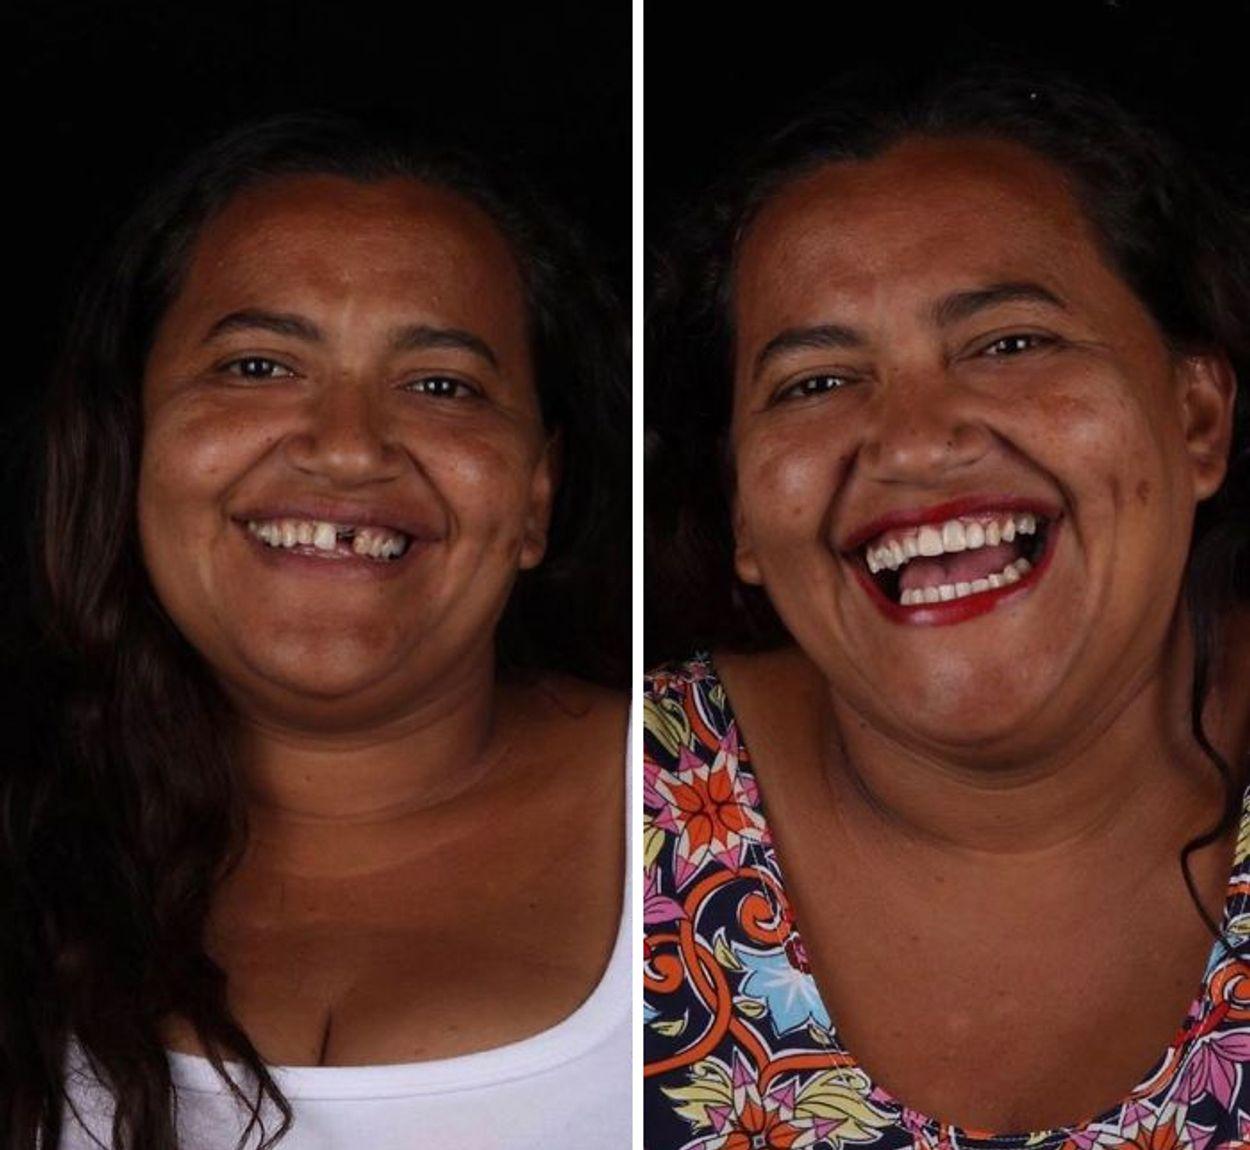 brazilian-dentist-travel-poor-people-teeth-fix-felipe-rossi-37-5db9515e41f4c__700